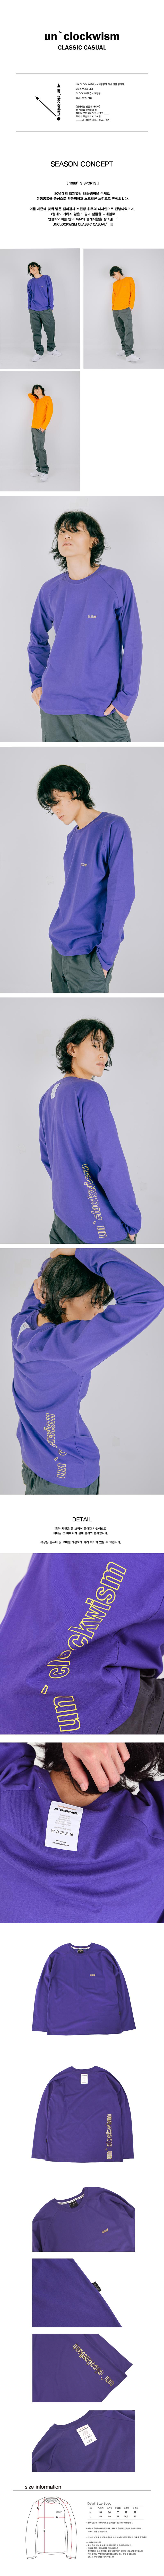 Basic Logo Back Side Printing Raglan t-shirt_purple.jpg